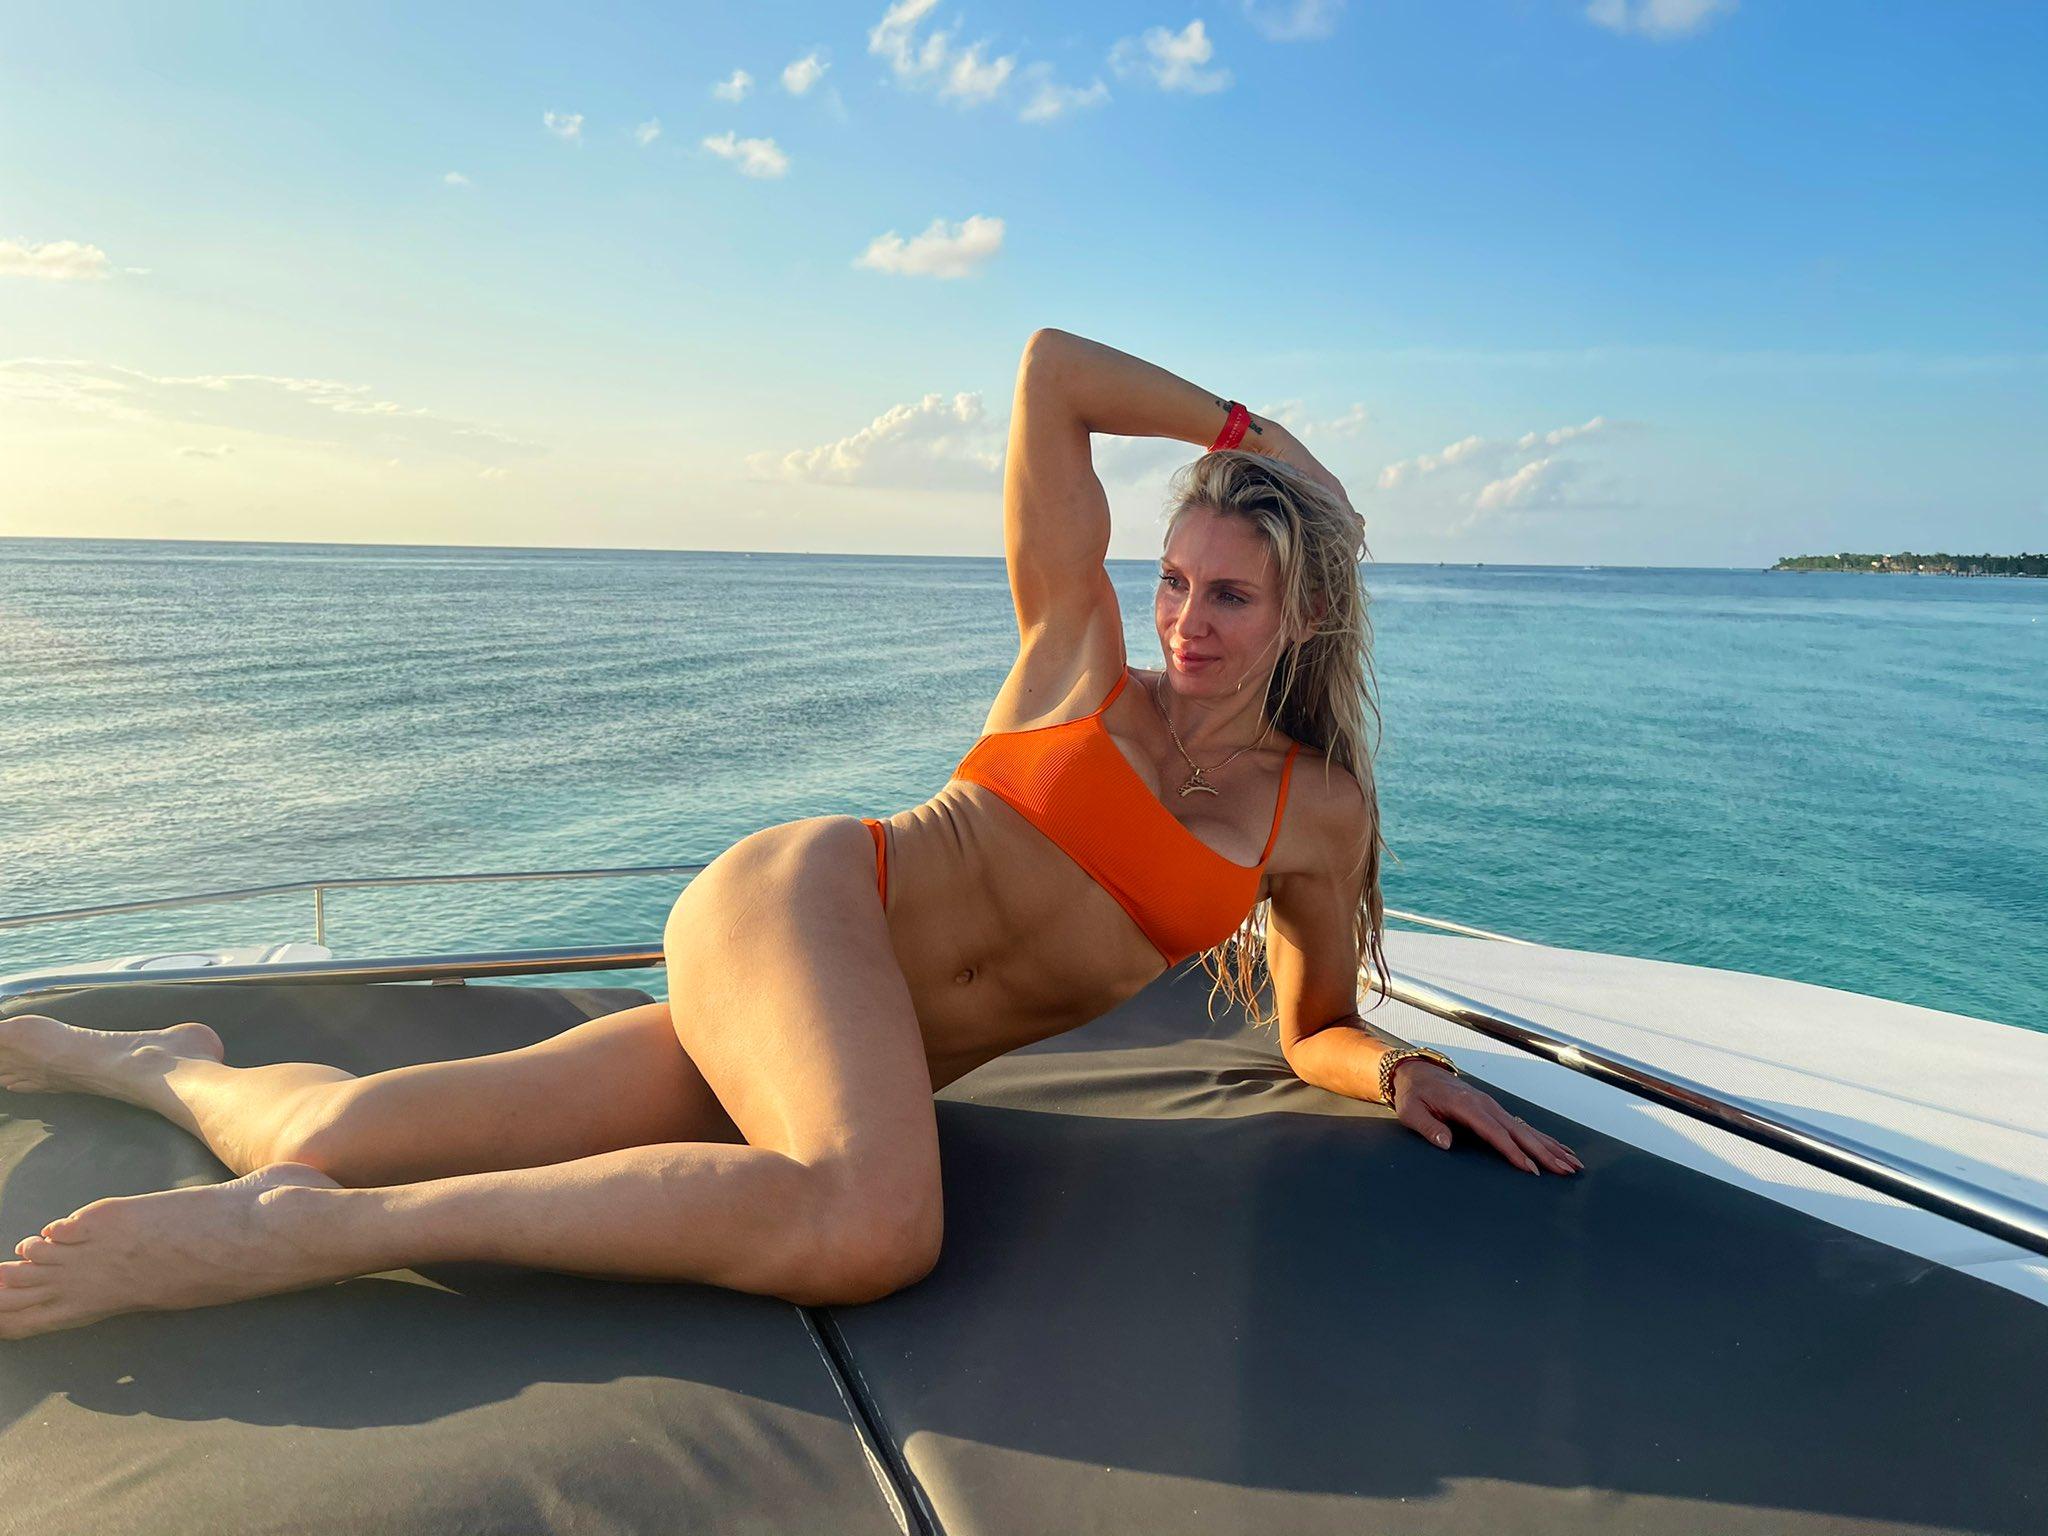 Photos: WWE Star Charlotte Flair Shares Bikini Spam From Latest Vacation 4